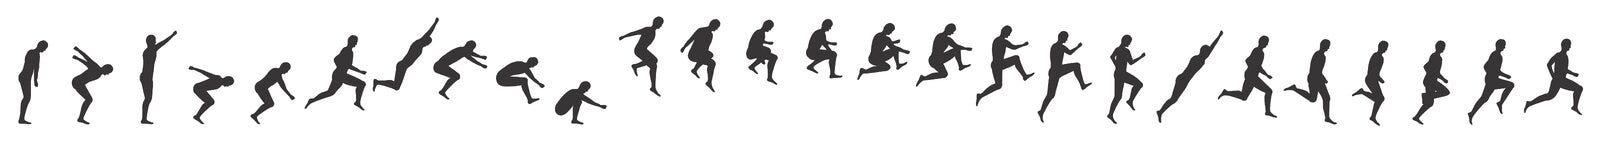 Springende mens Stock Illustratie